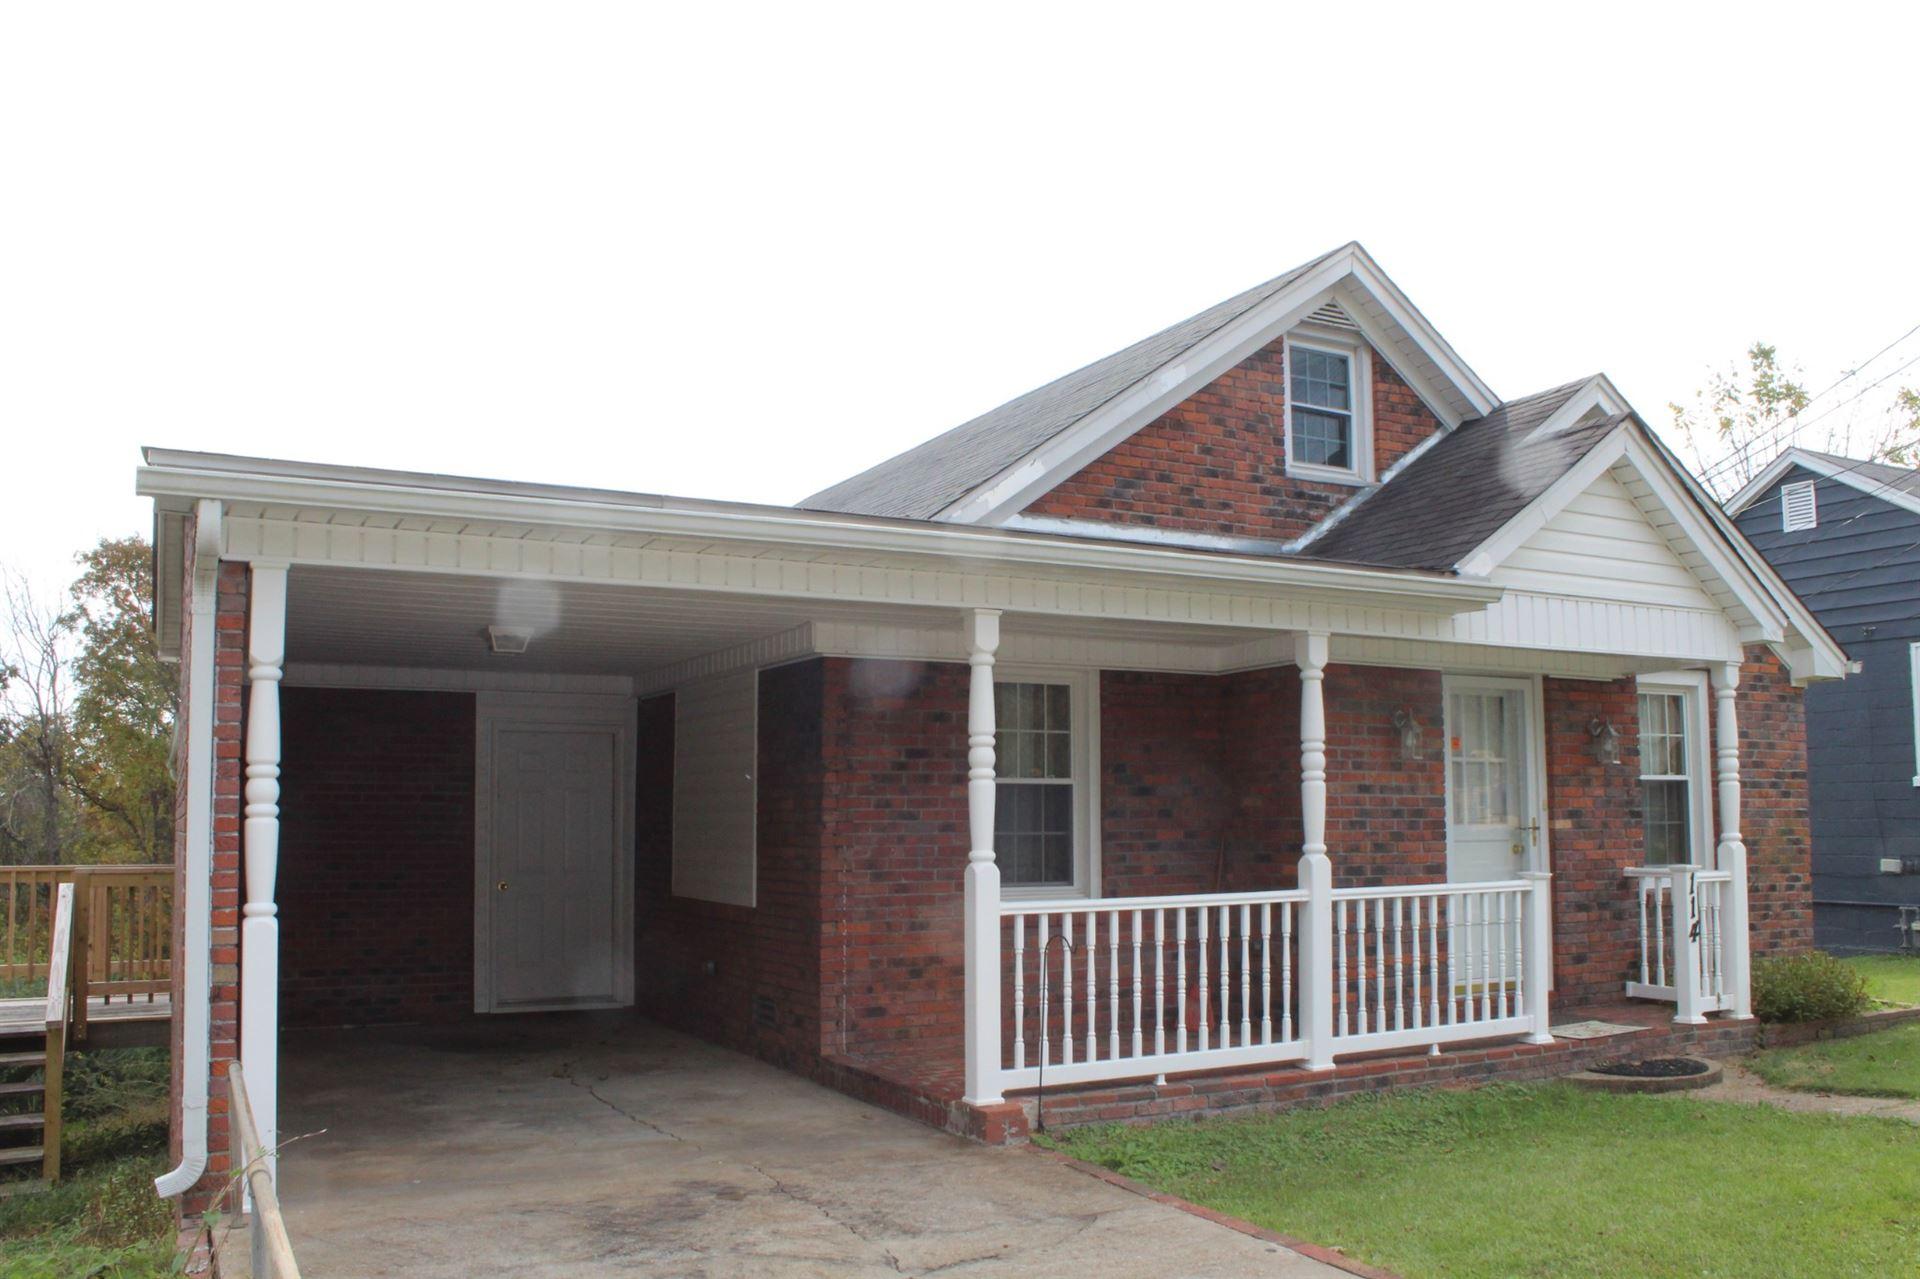 Photo of 114 Mathis St W #na, Waynesboro, TN 38485 (MLS # 2201404)